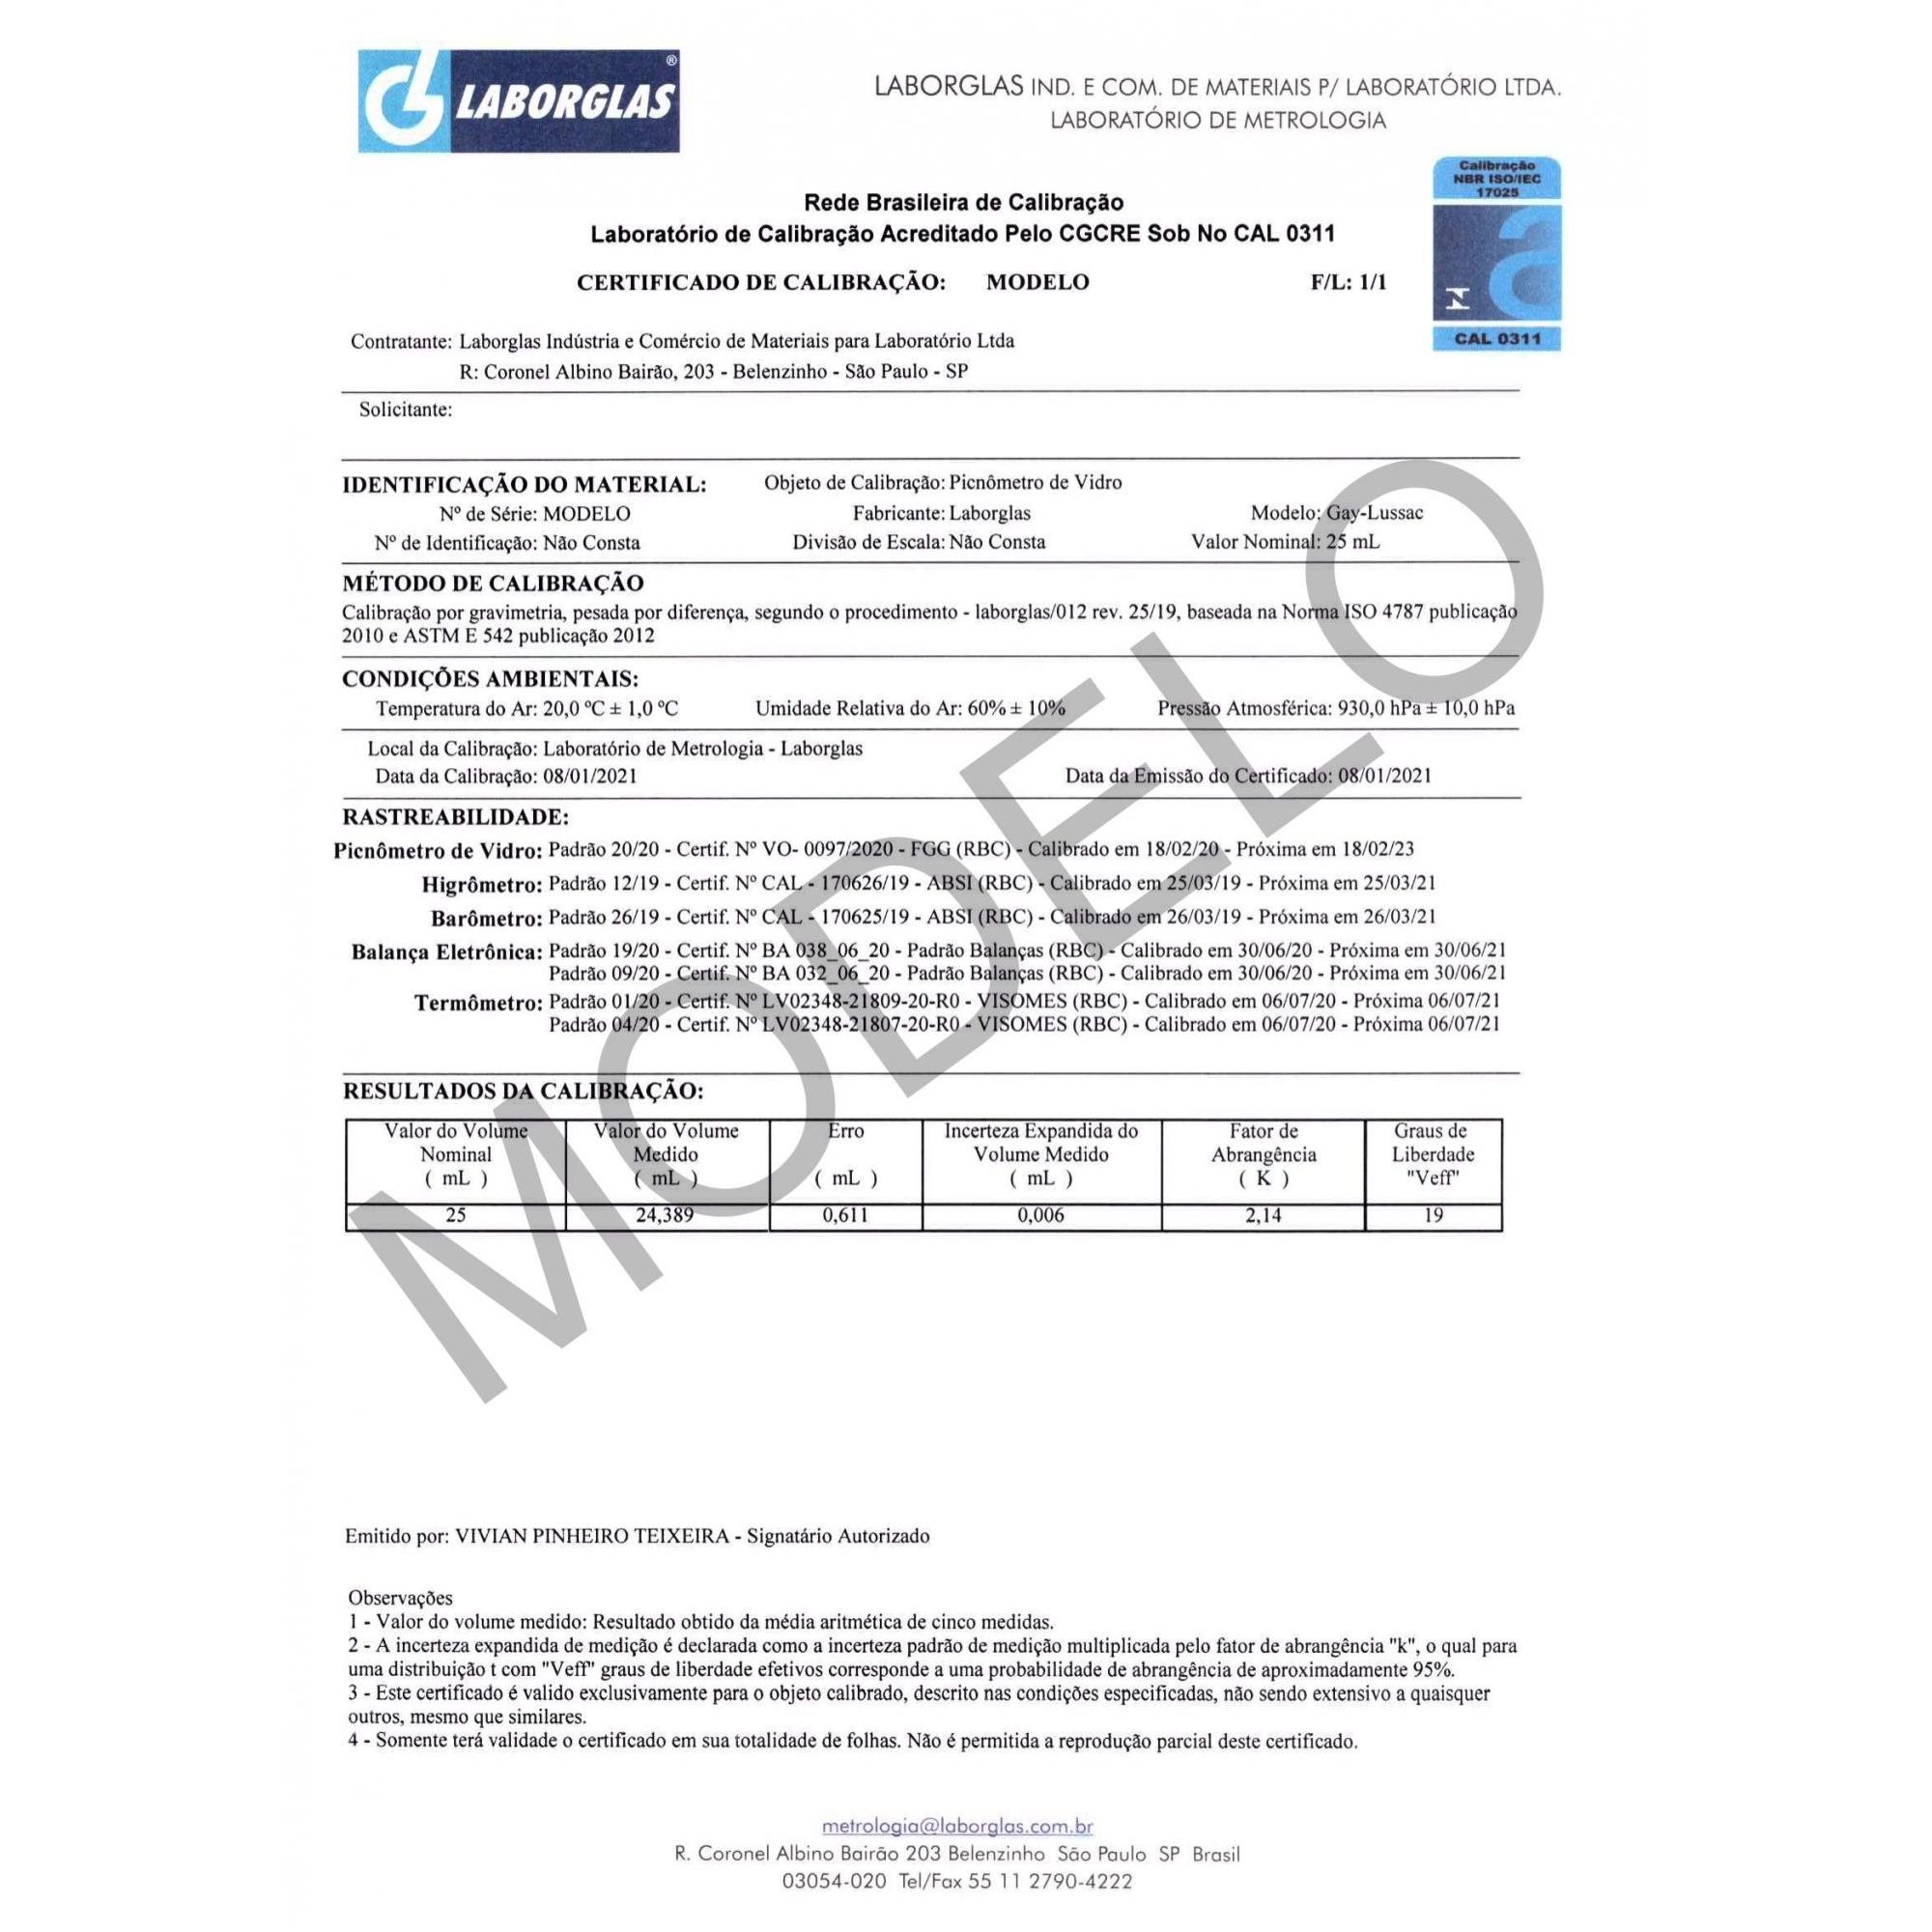 PICNÔMETRO GAY-LUSSAC SEM TERMÔMETRO 25 ML CERTIFICADO RBC - Laborglas - Cód. 9491114-R